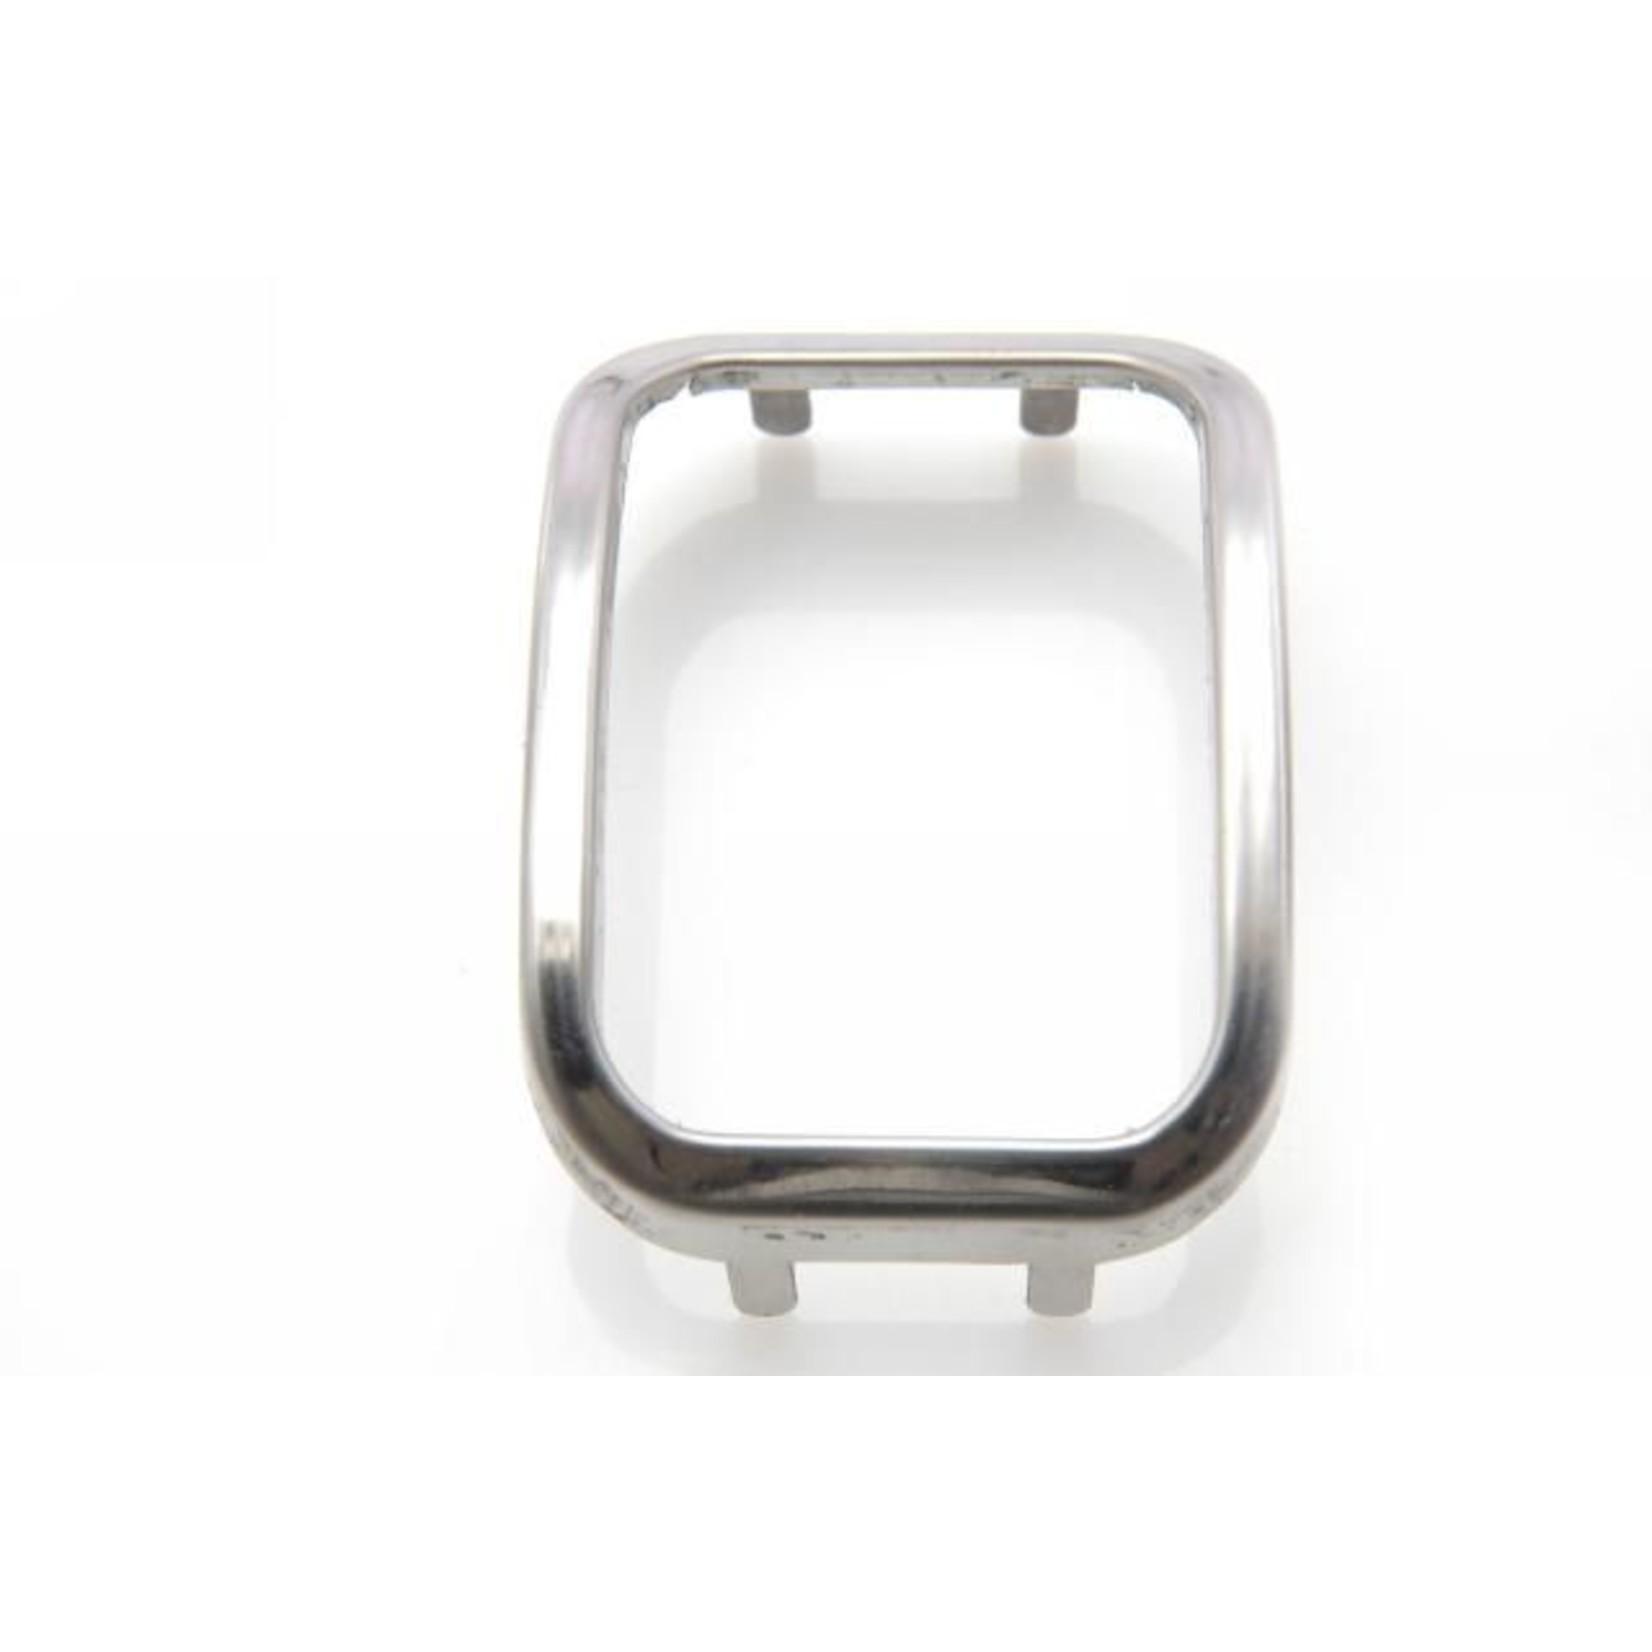 Embellecedor pedal parking Inox Nr Org: DX45471